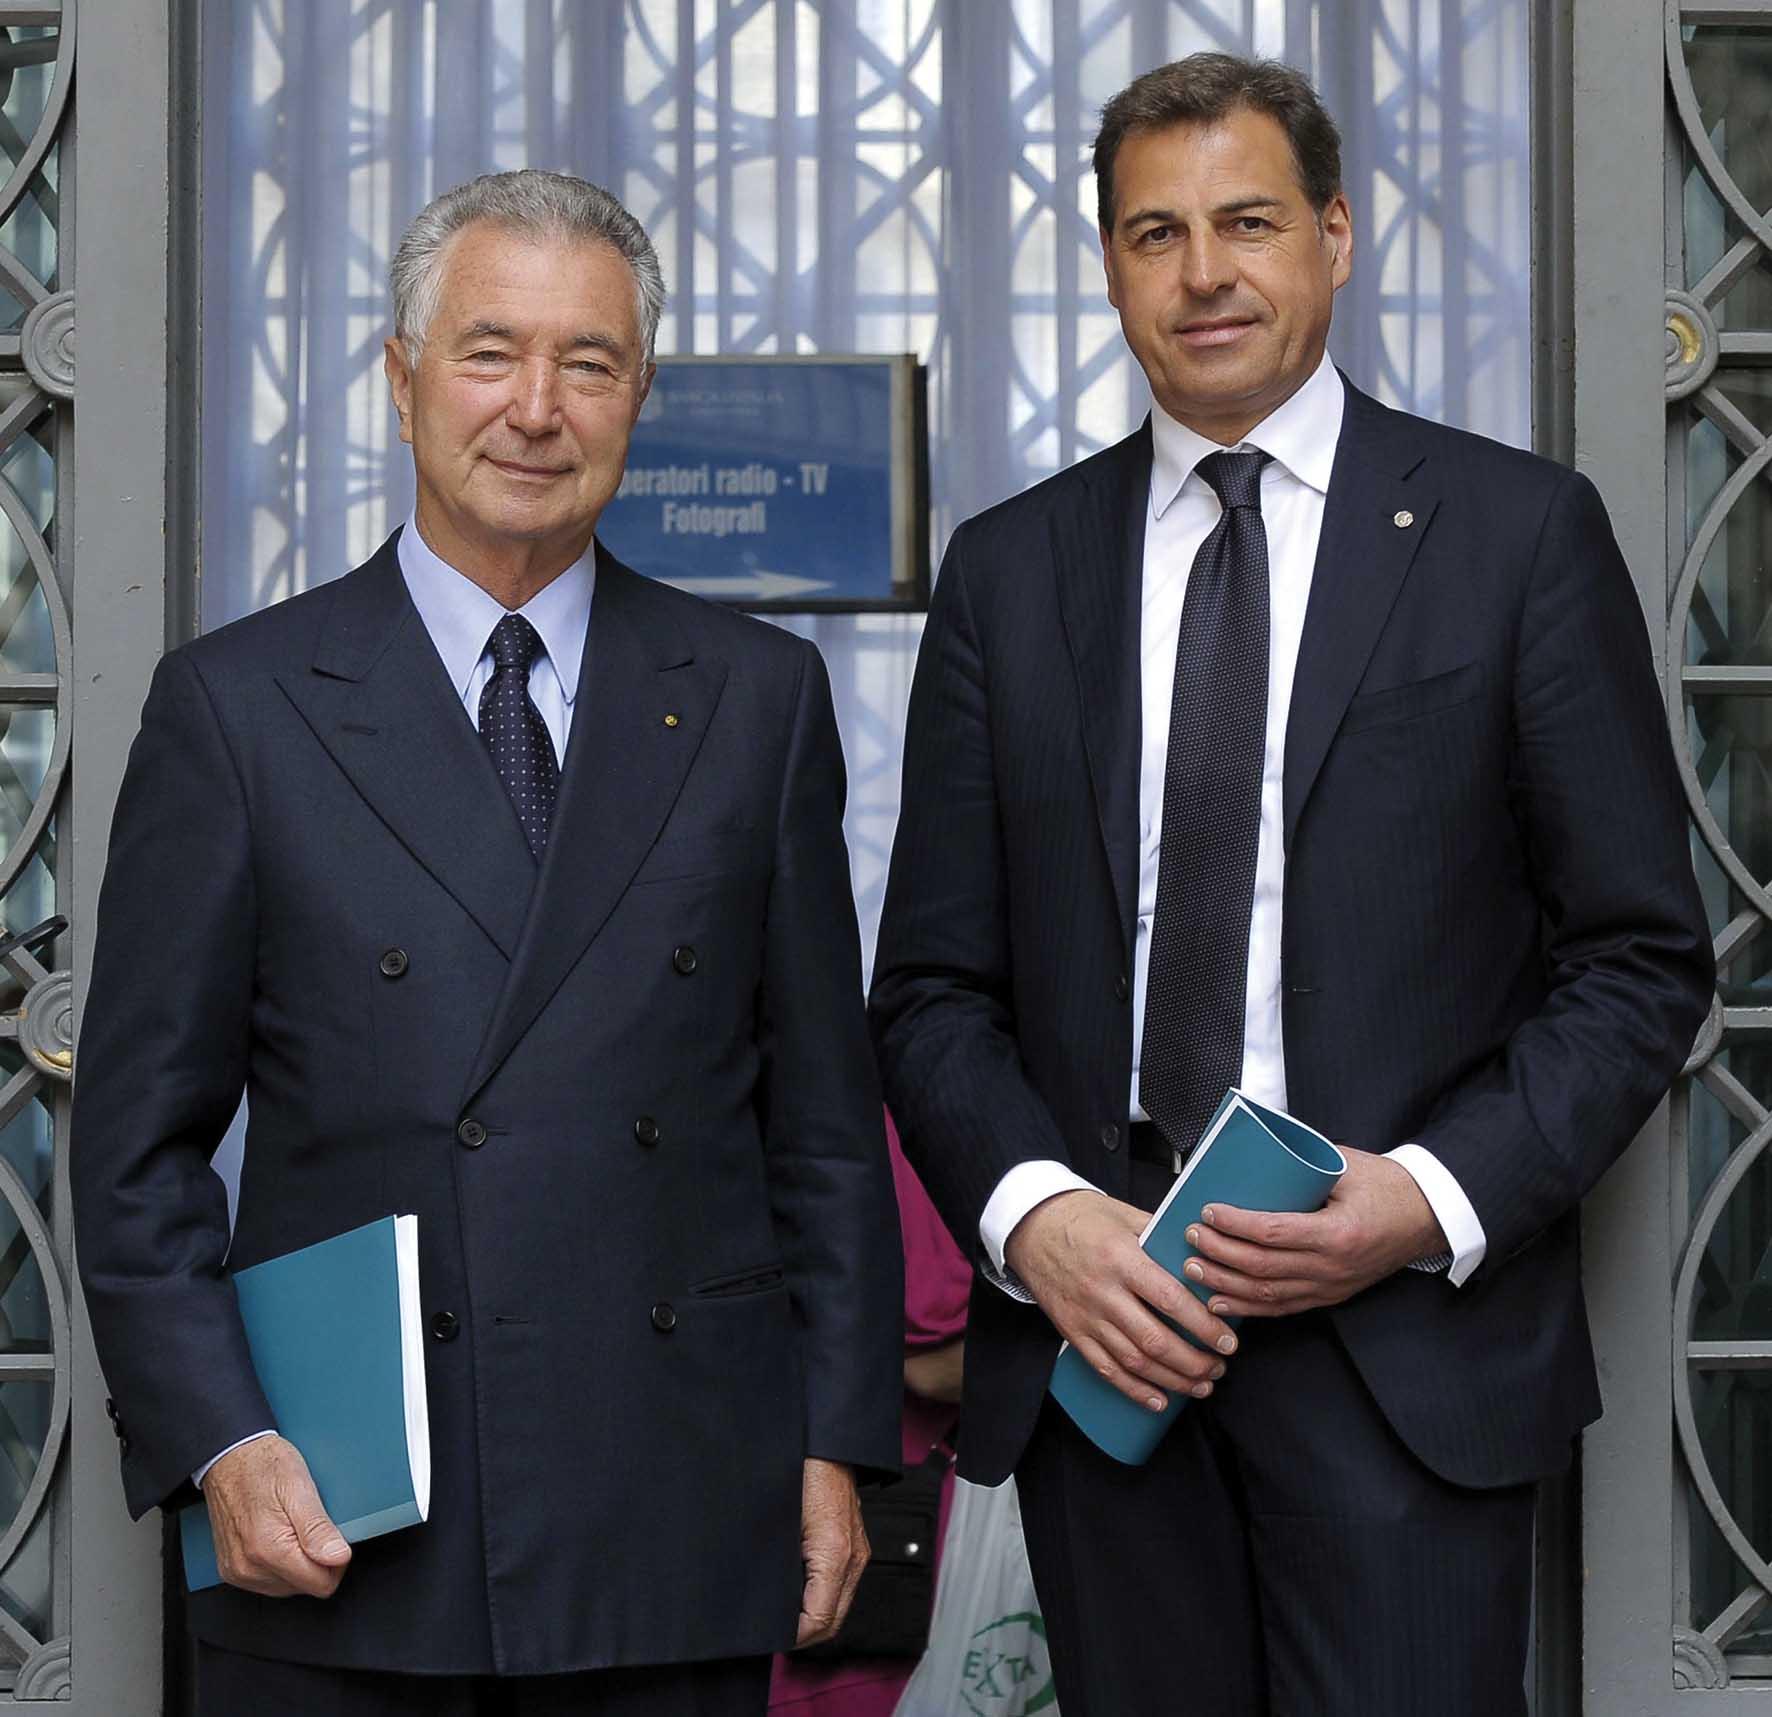 Banca popolare Vicenza Gianni Zonin Presidente Samuele Sorato Direttore Generale